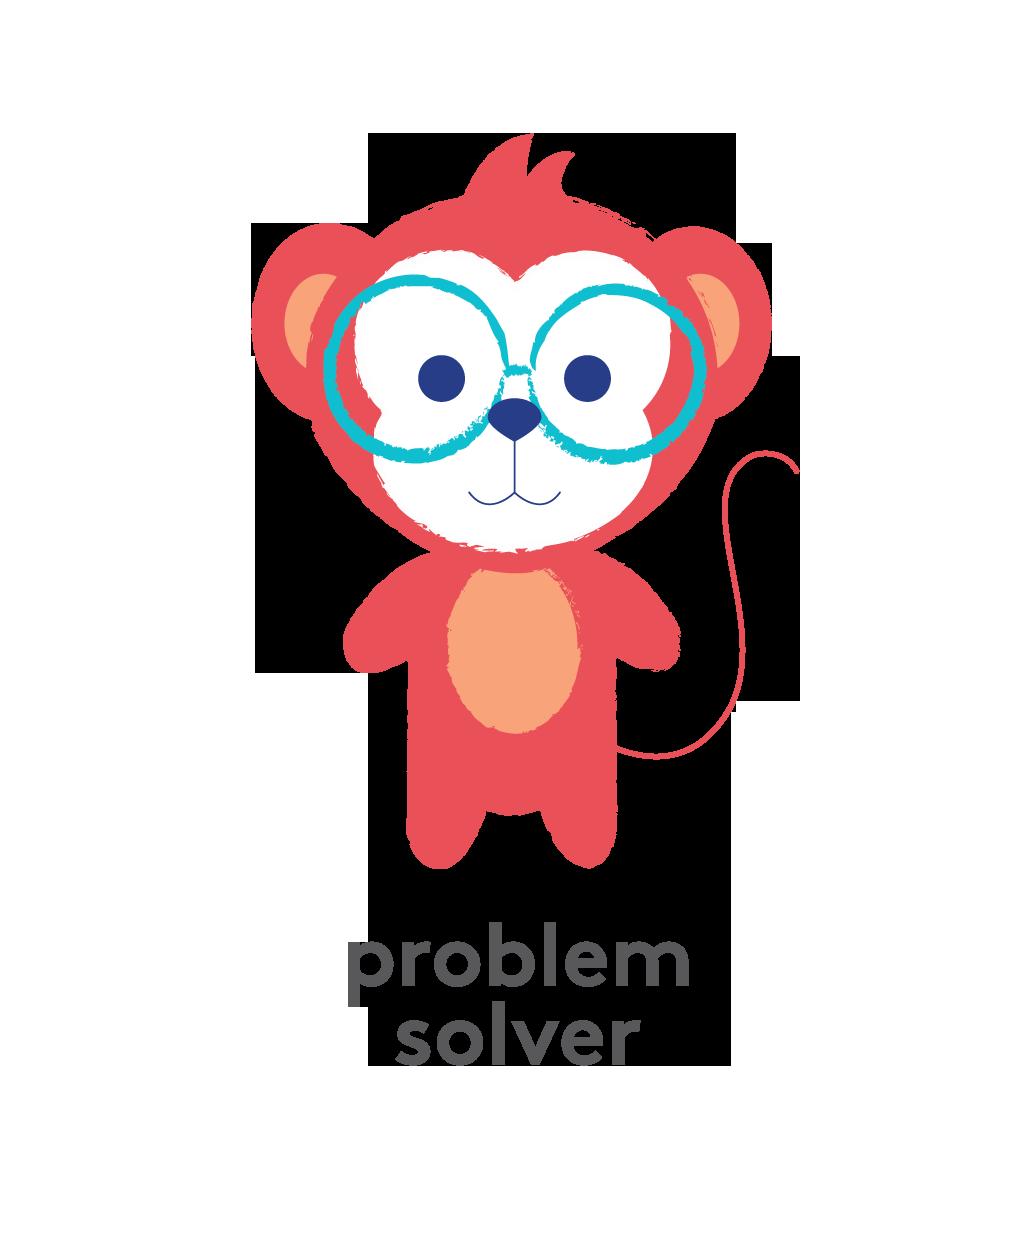 Chimp: Problem Solver